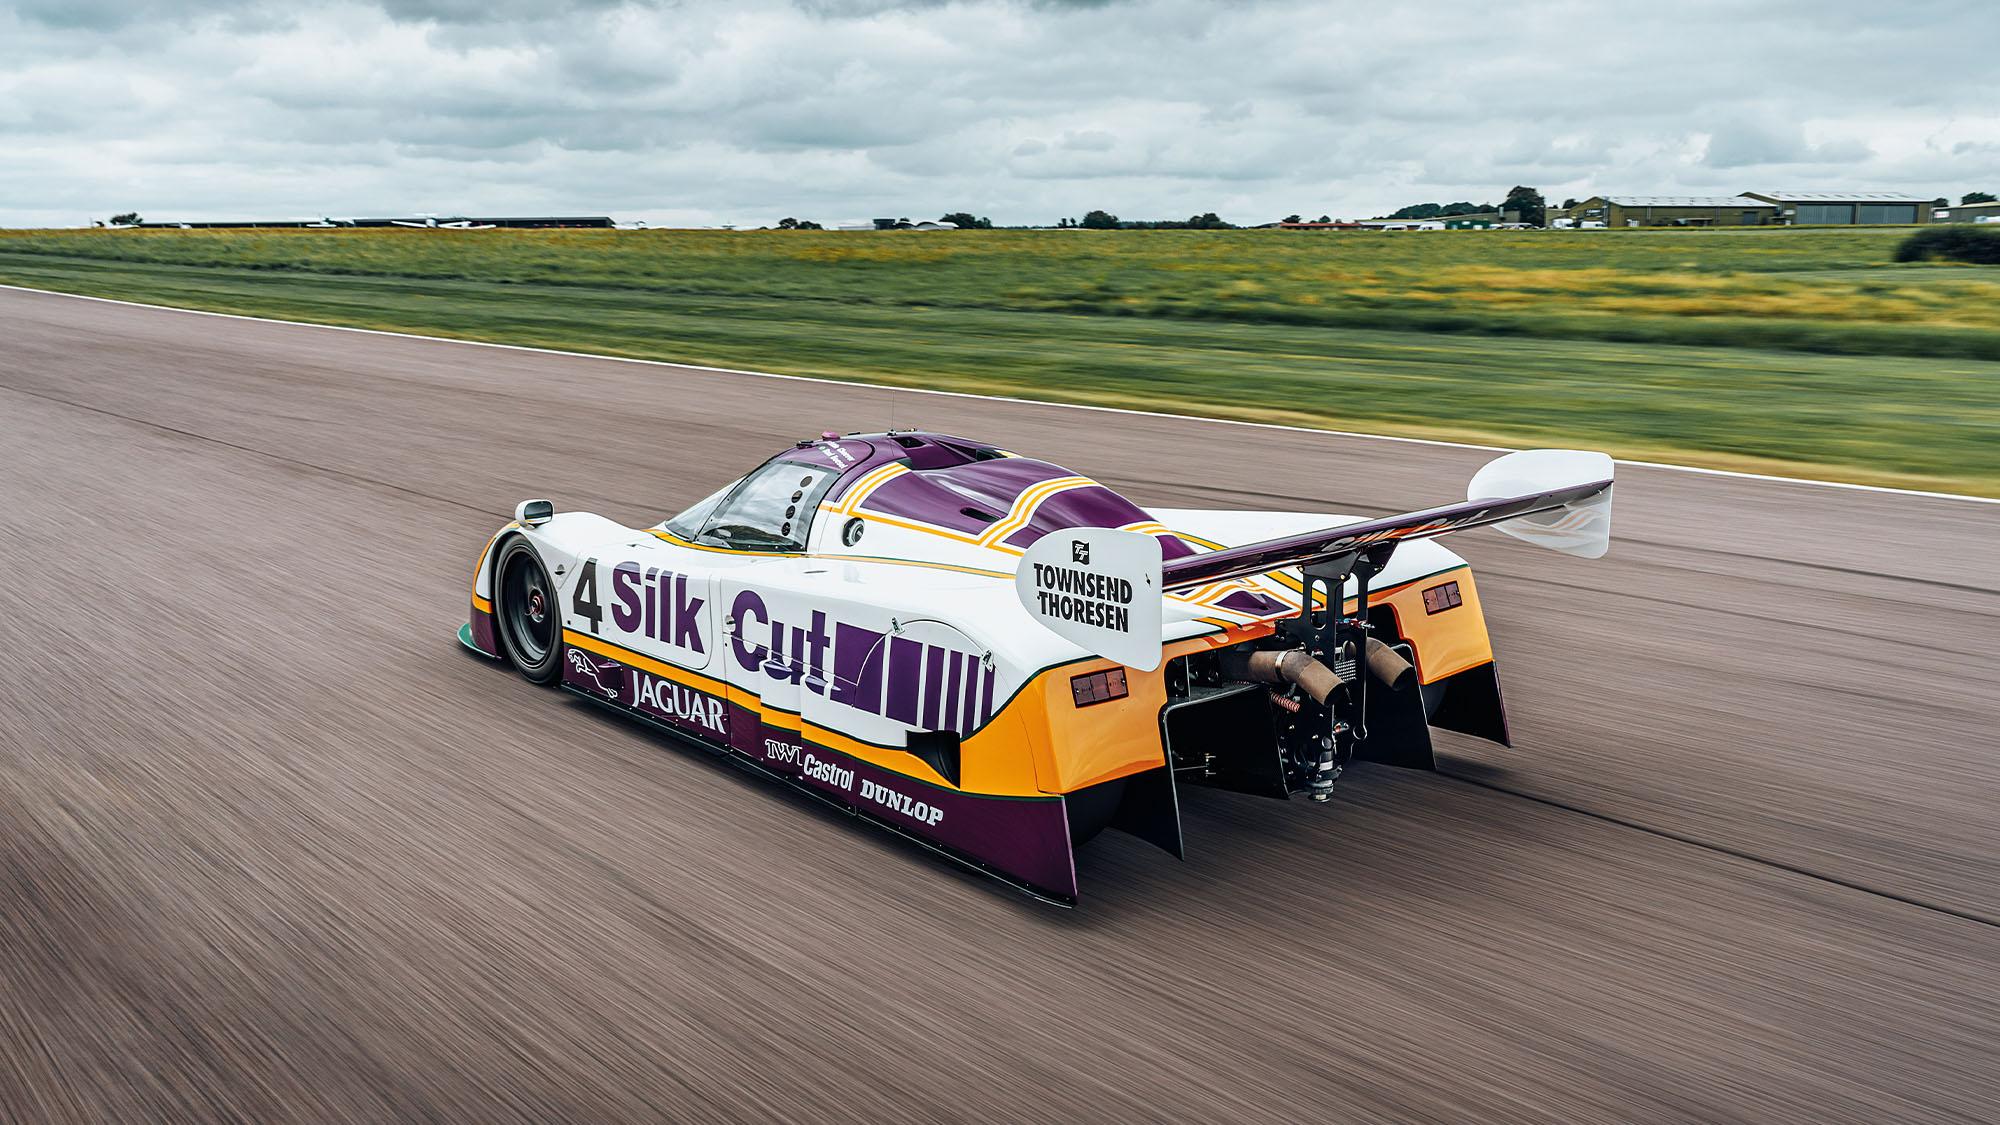 Jaguar XJR-8 on track at Thruxton